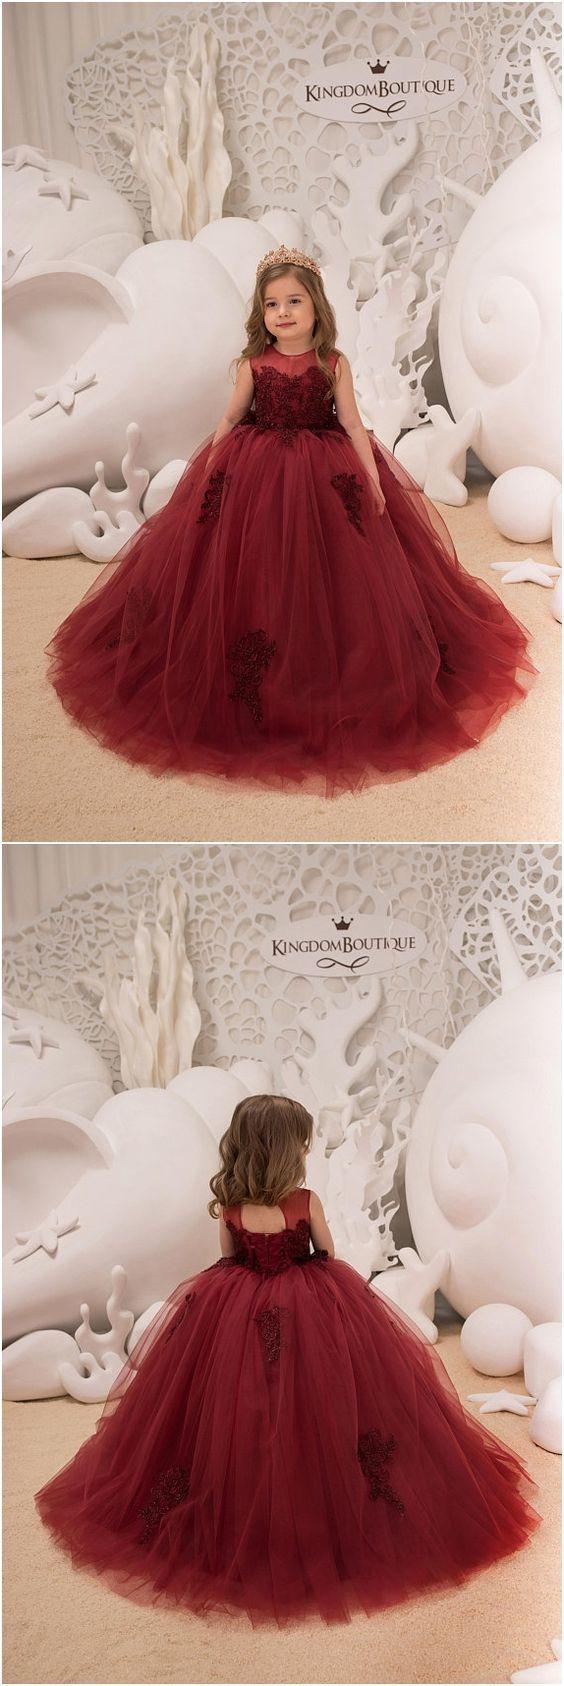 Flower Girl Dress - Birthday Wedding party Bridesmaid Holiday Maroon Lace